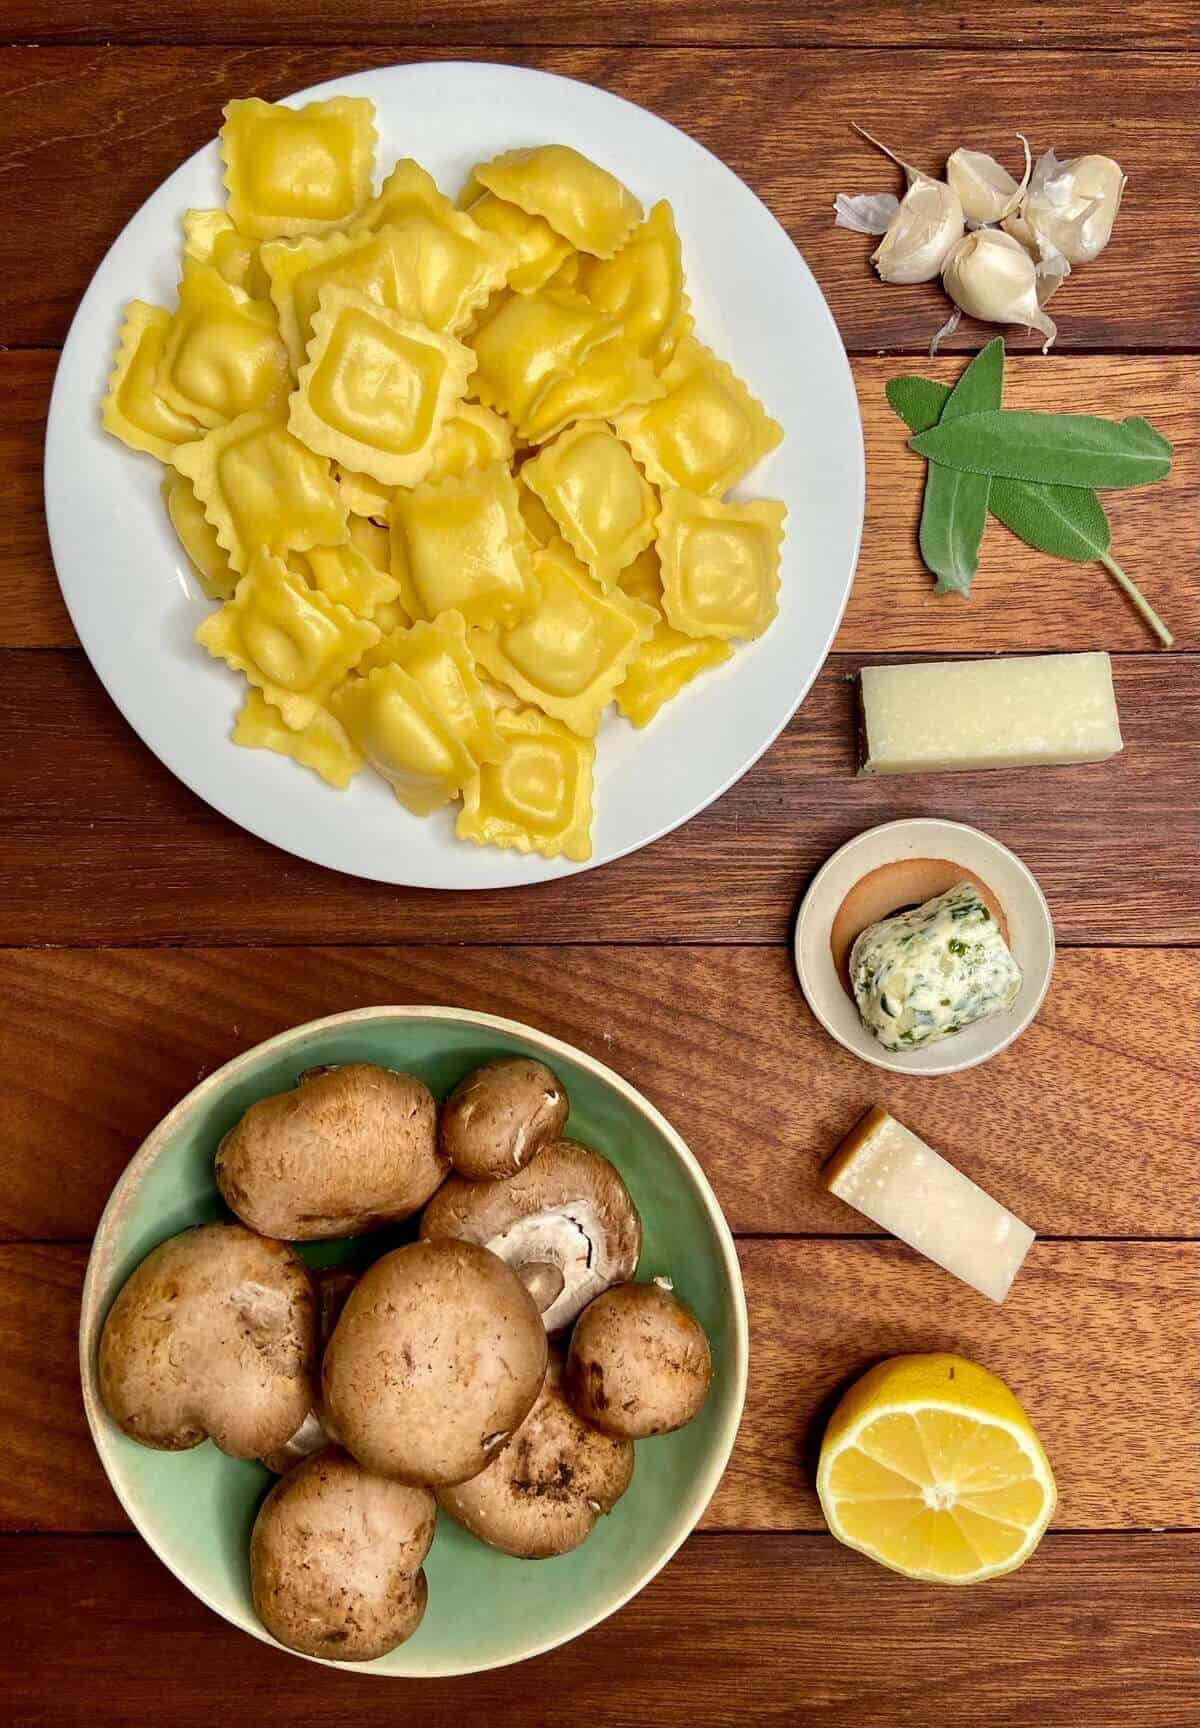 Crispy Ravioli Formaggi (Photo by Erich Boenzli)